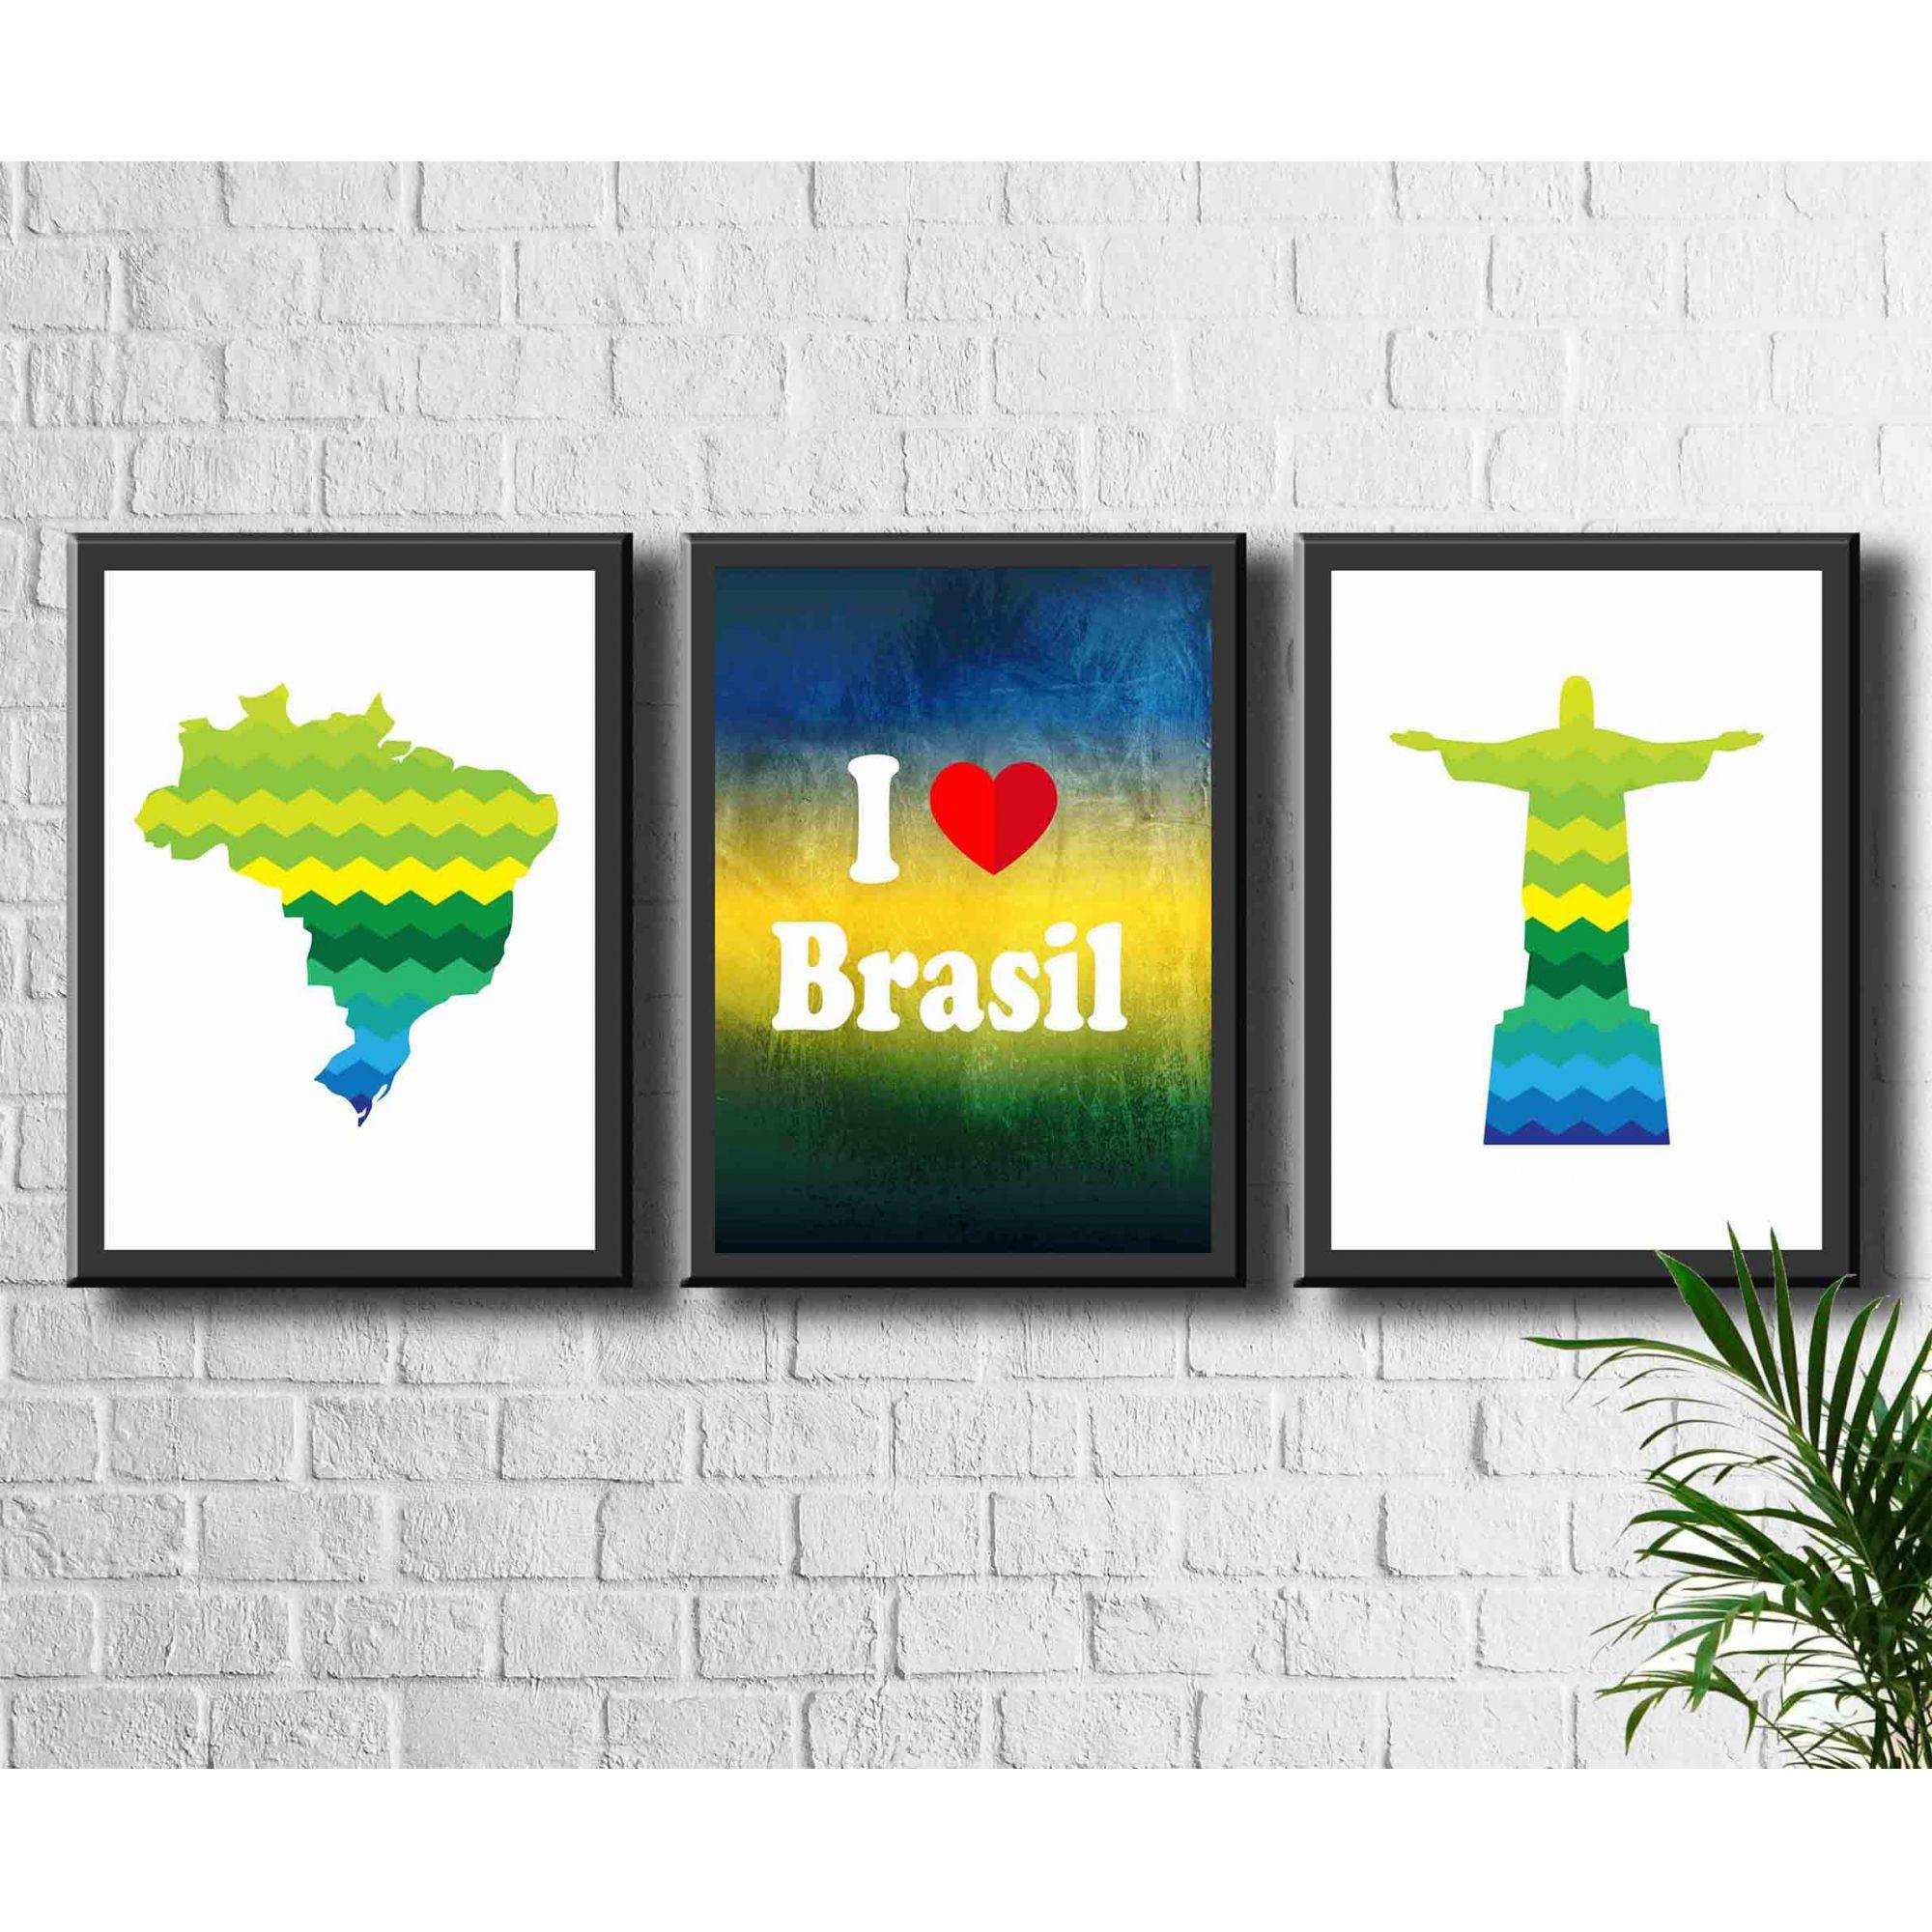 Kit 3 Quadros Decorativos Futebol Cristo Redentor Copa